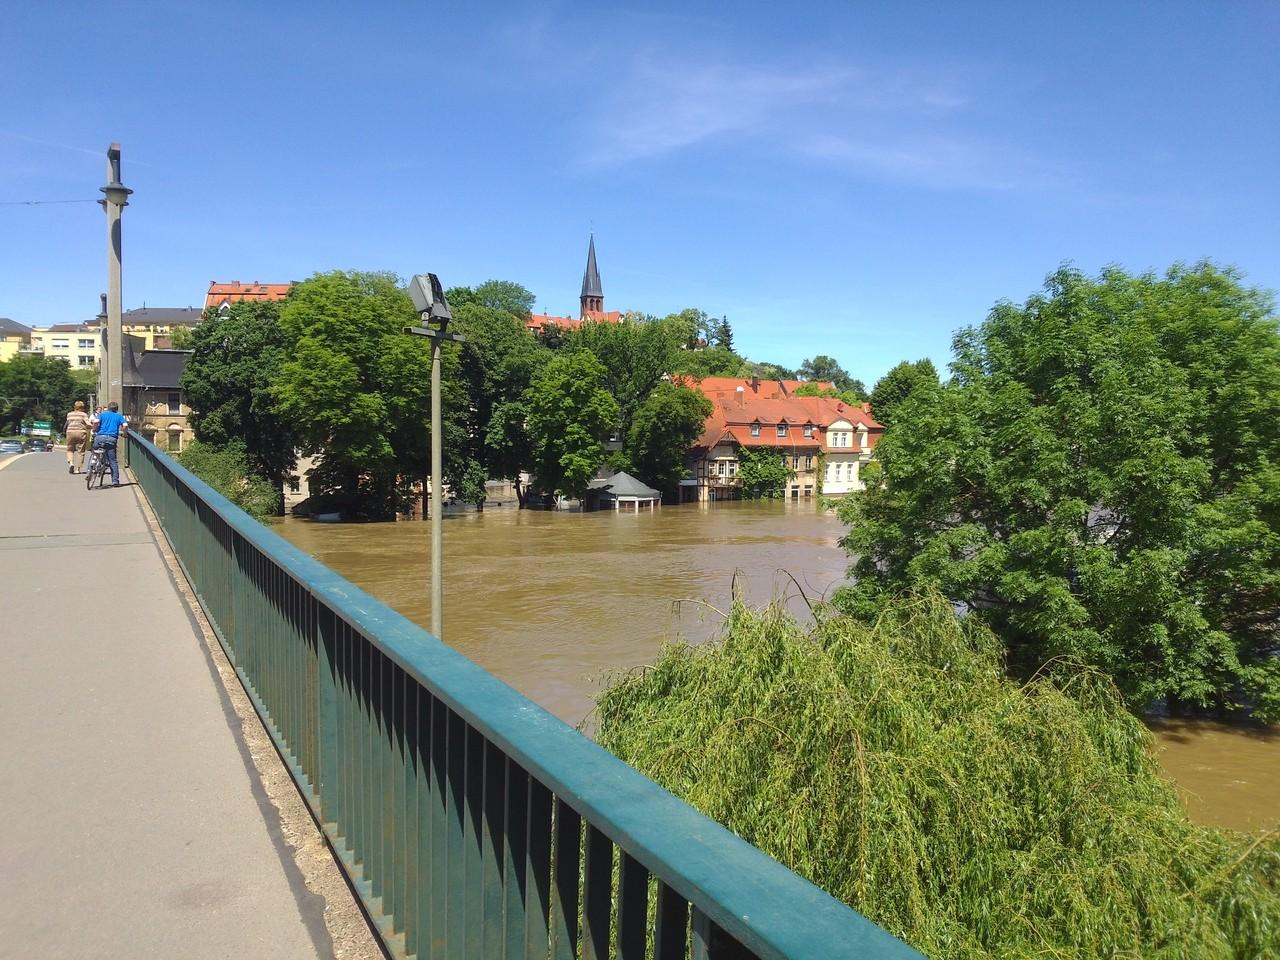 Kröllwitzer Brücke Blickrichtung Halle/Trotha